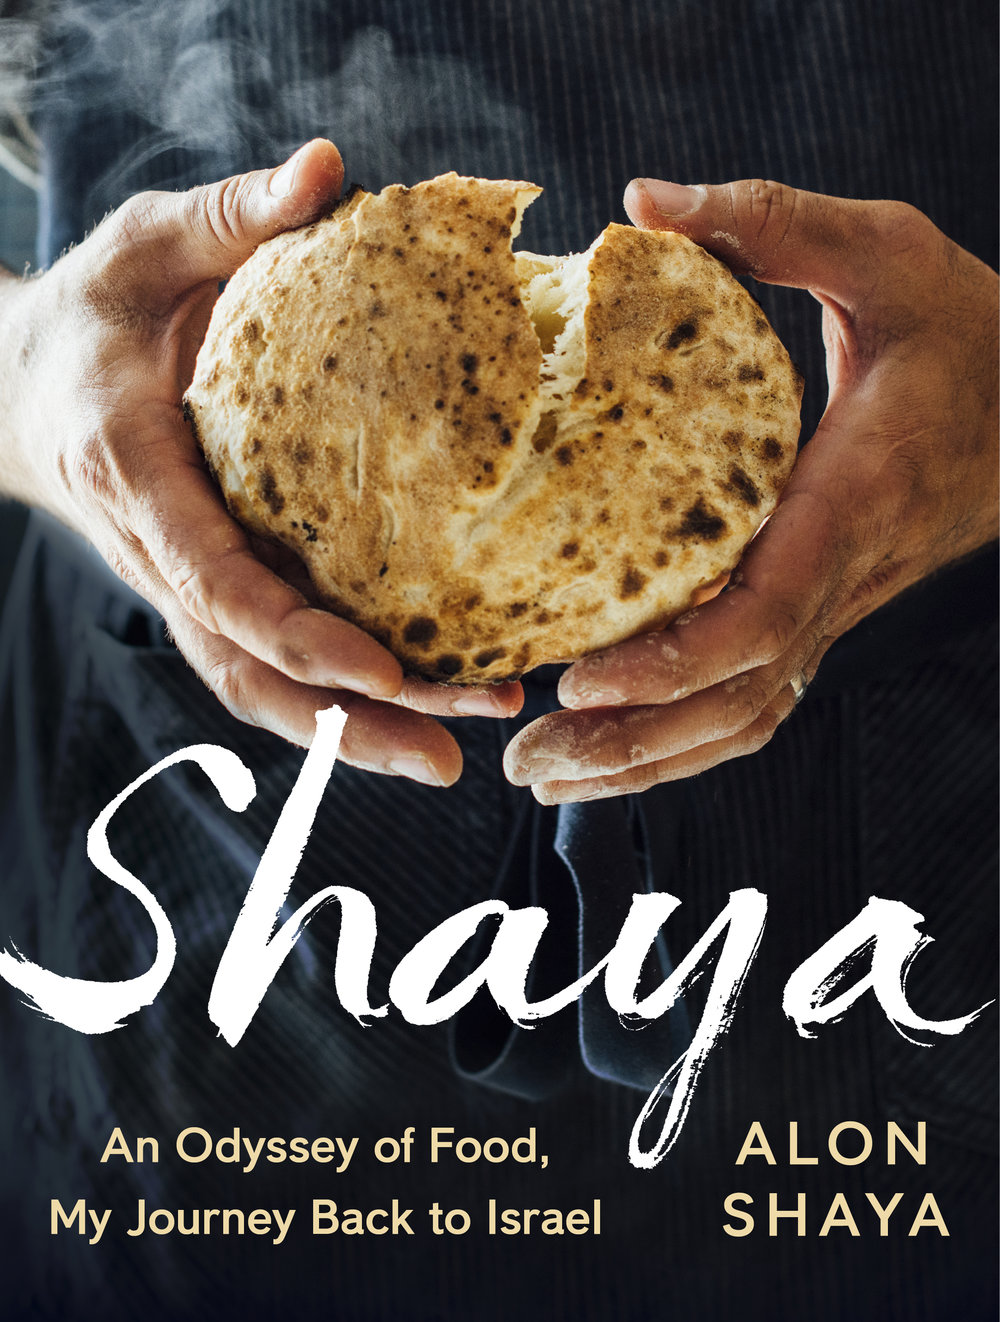 shaya_book_cover.jpg